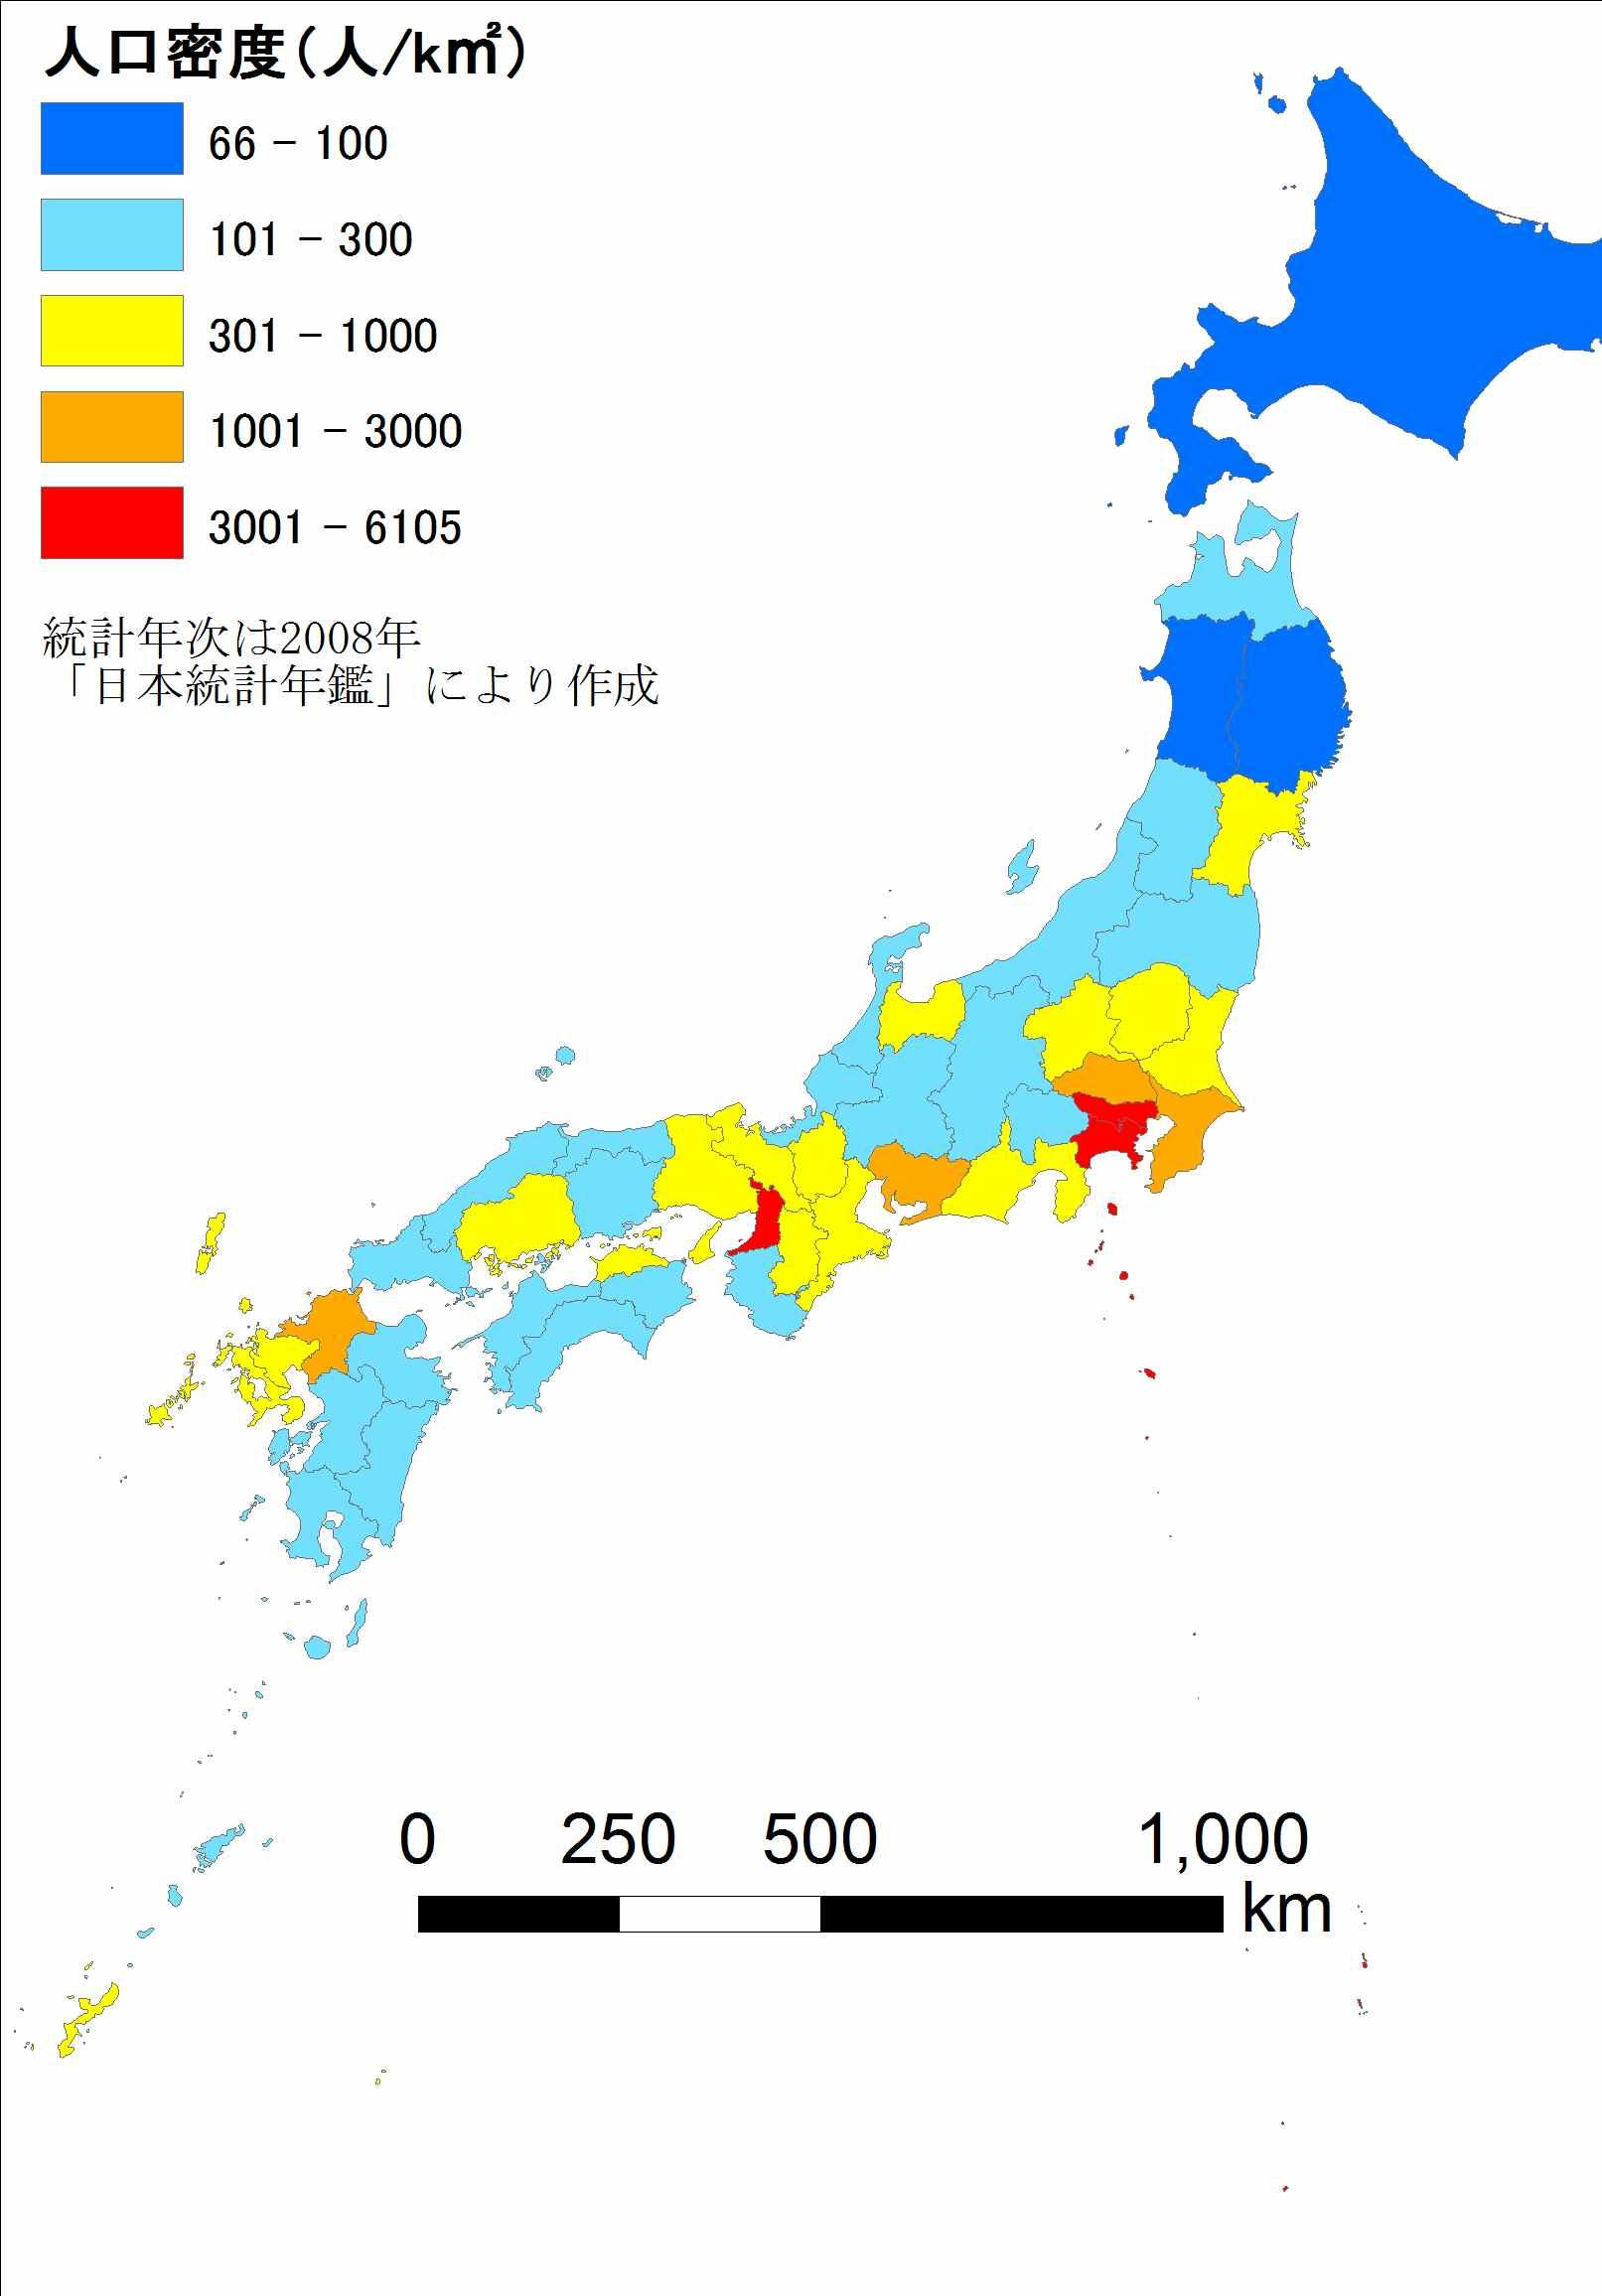 Japan Pop Density : 日本地図 教材 : 日本